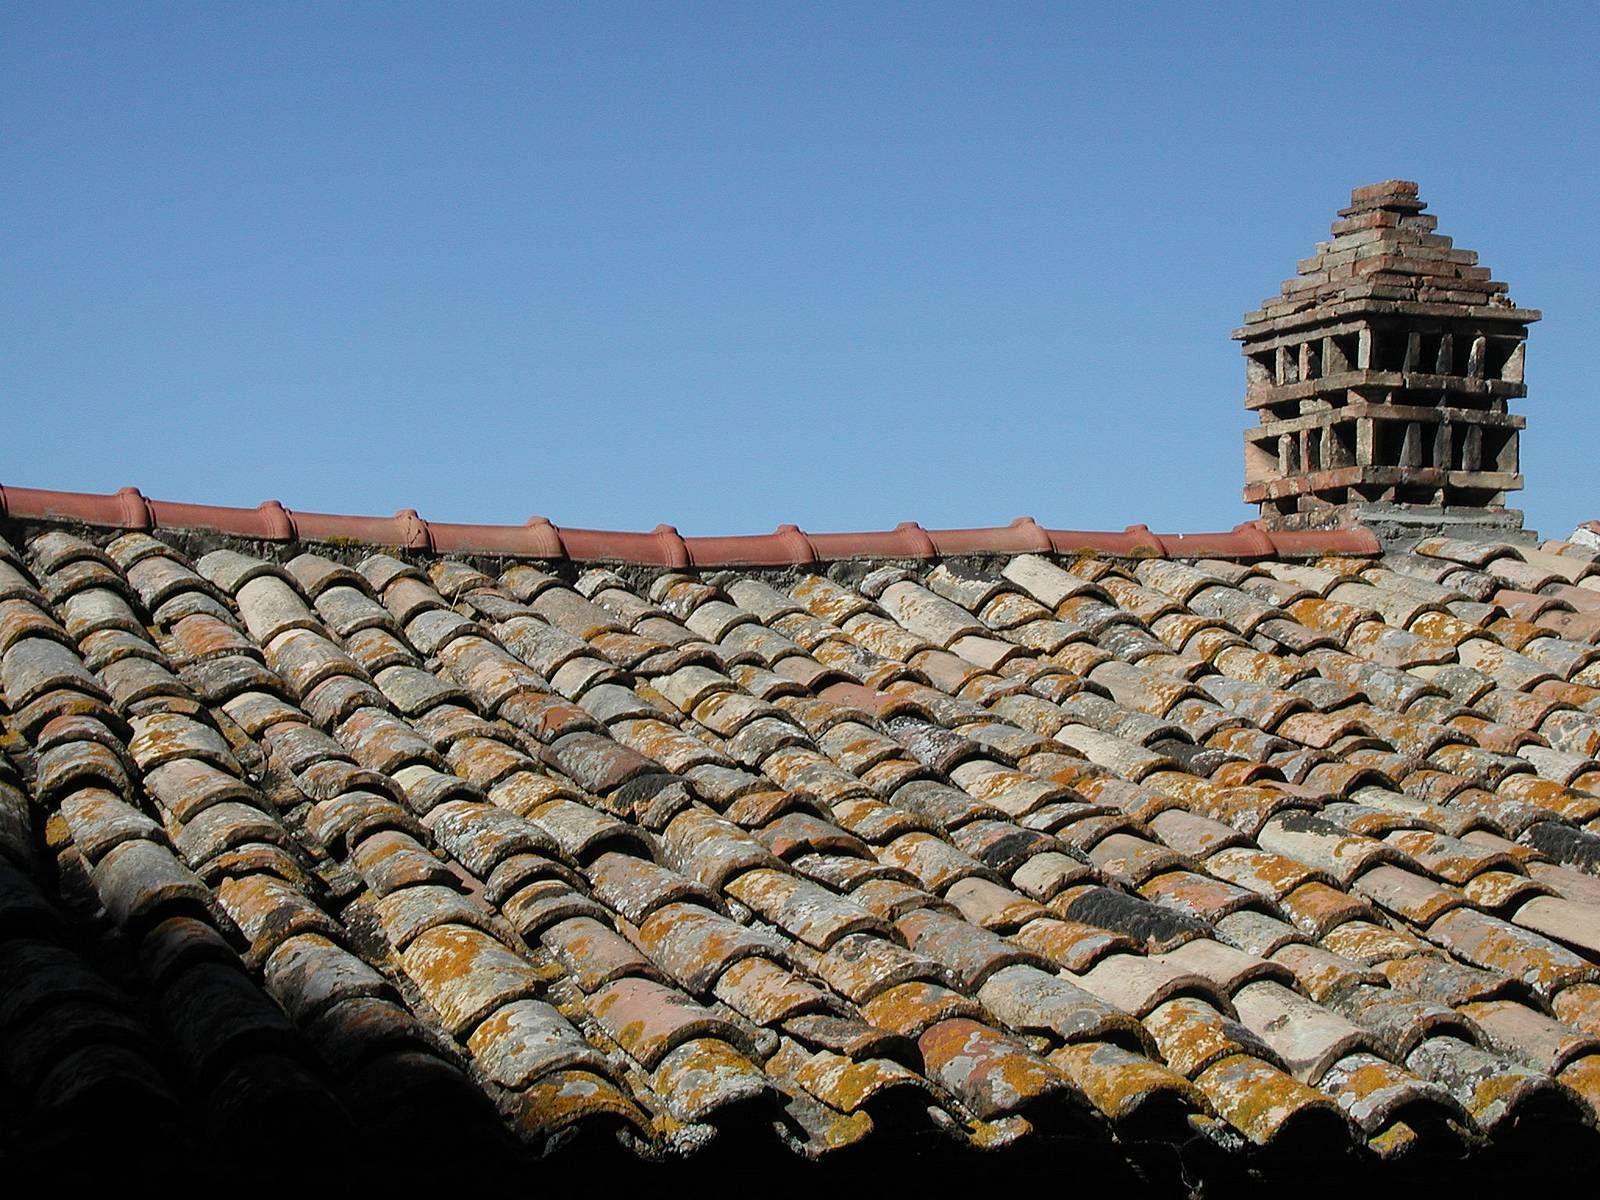 chimney-roof.jpg (1600×1200)